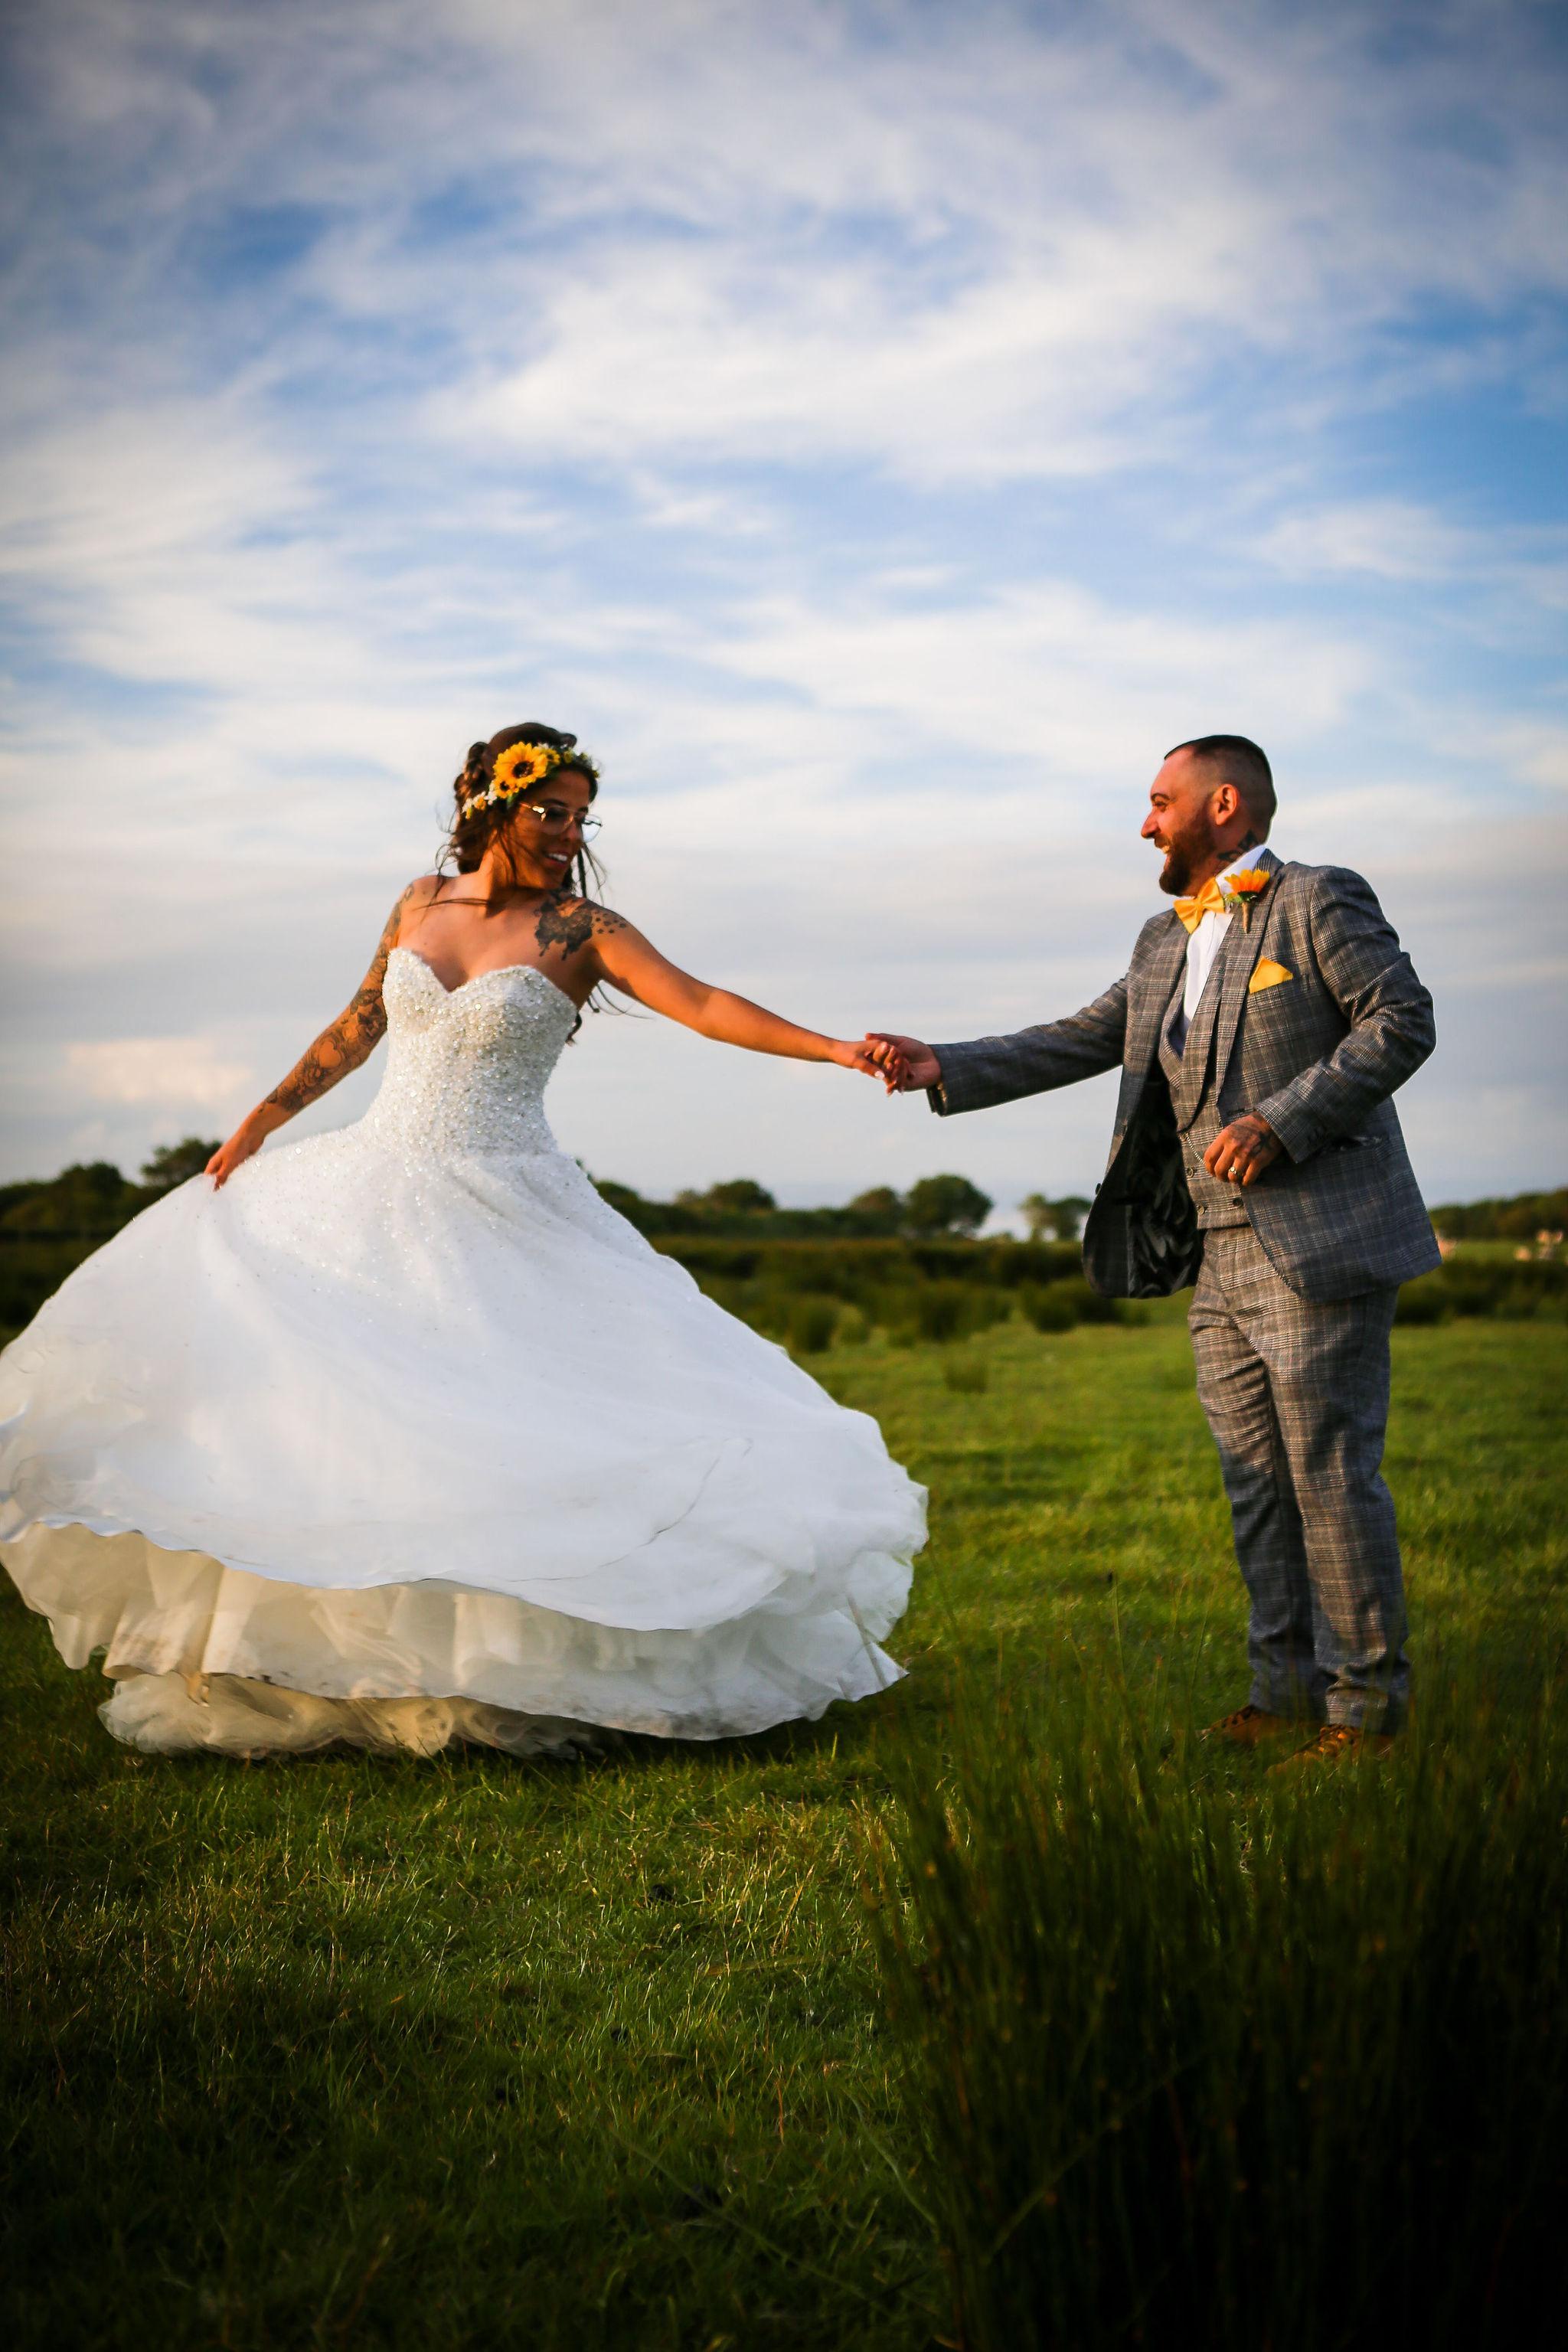 Harriet&Rhys Wedding - Magical sunflower wedding - bride and groom